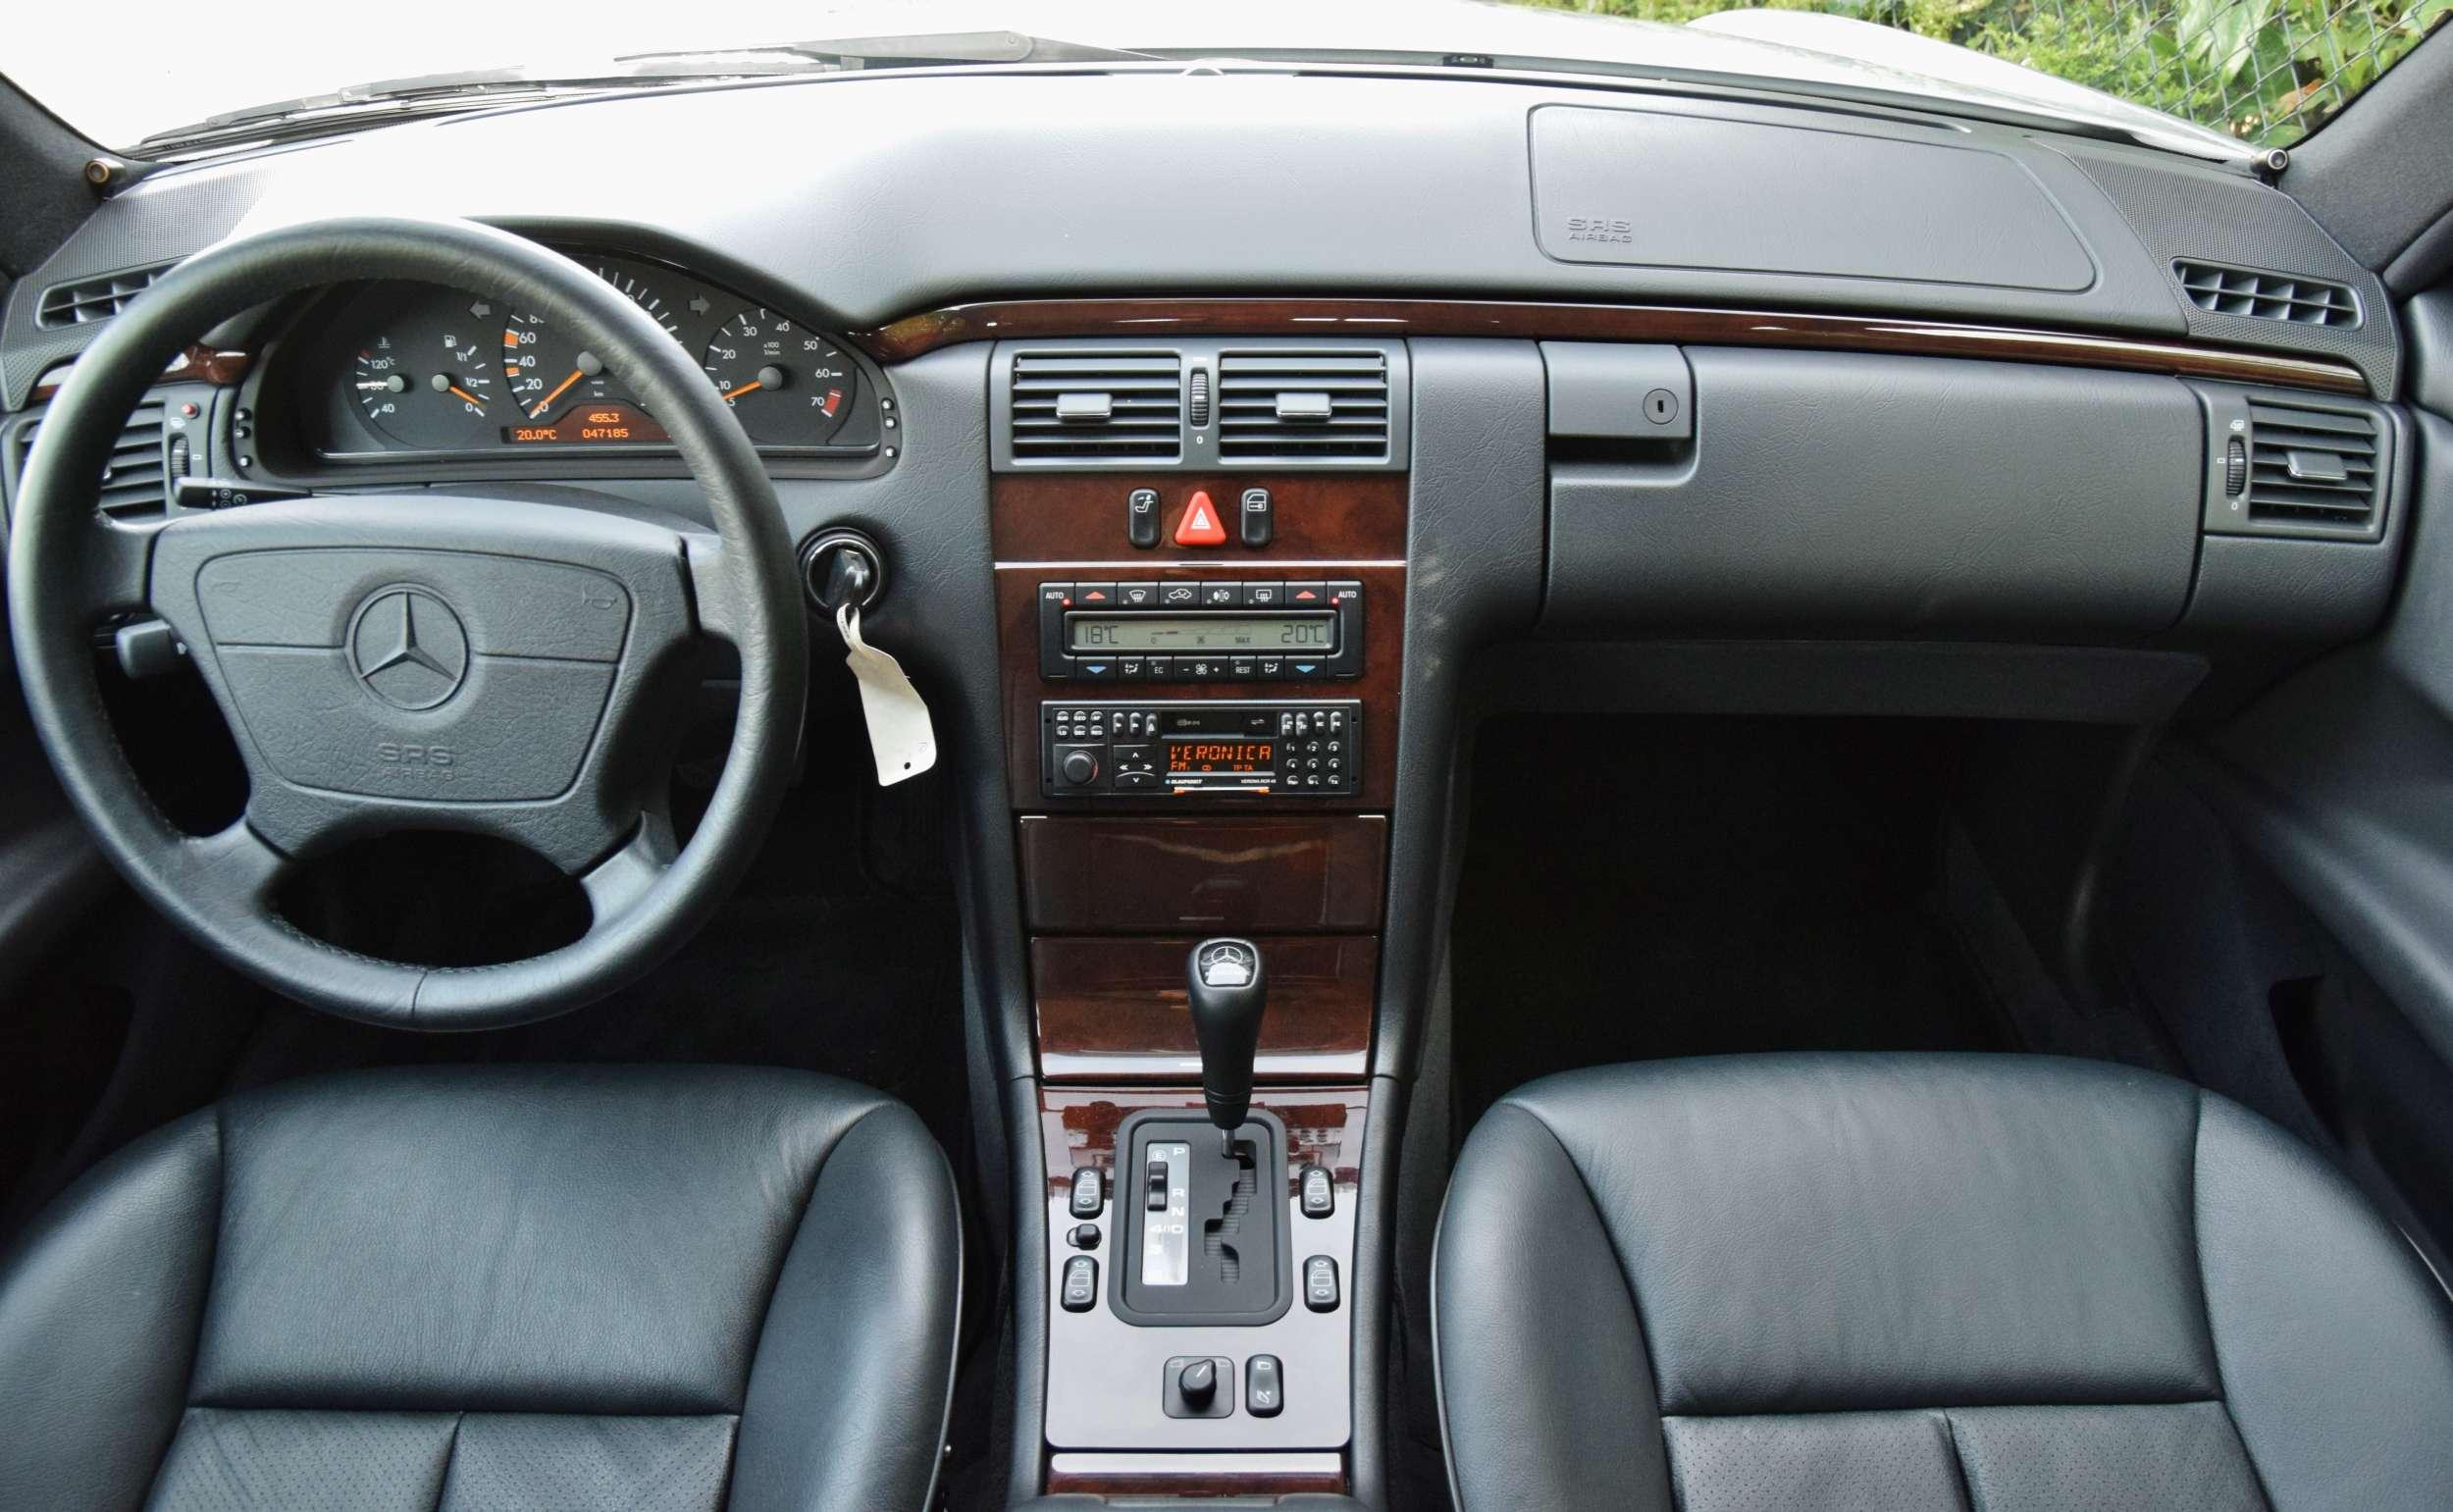 Mercedes E320 29